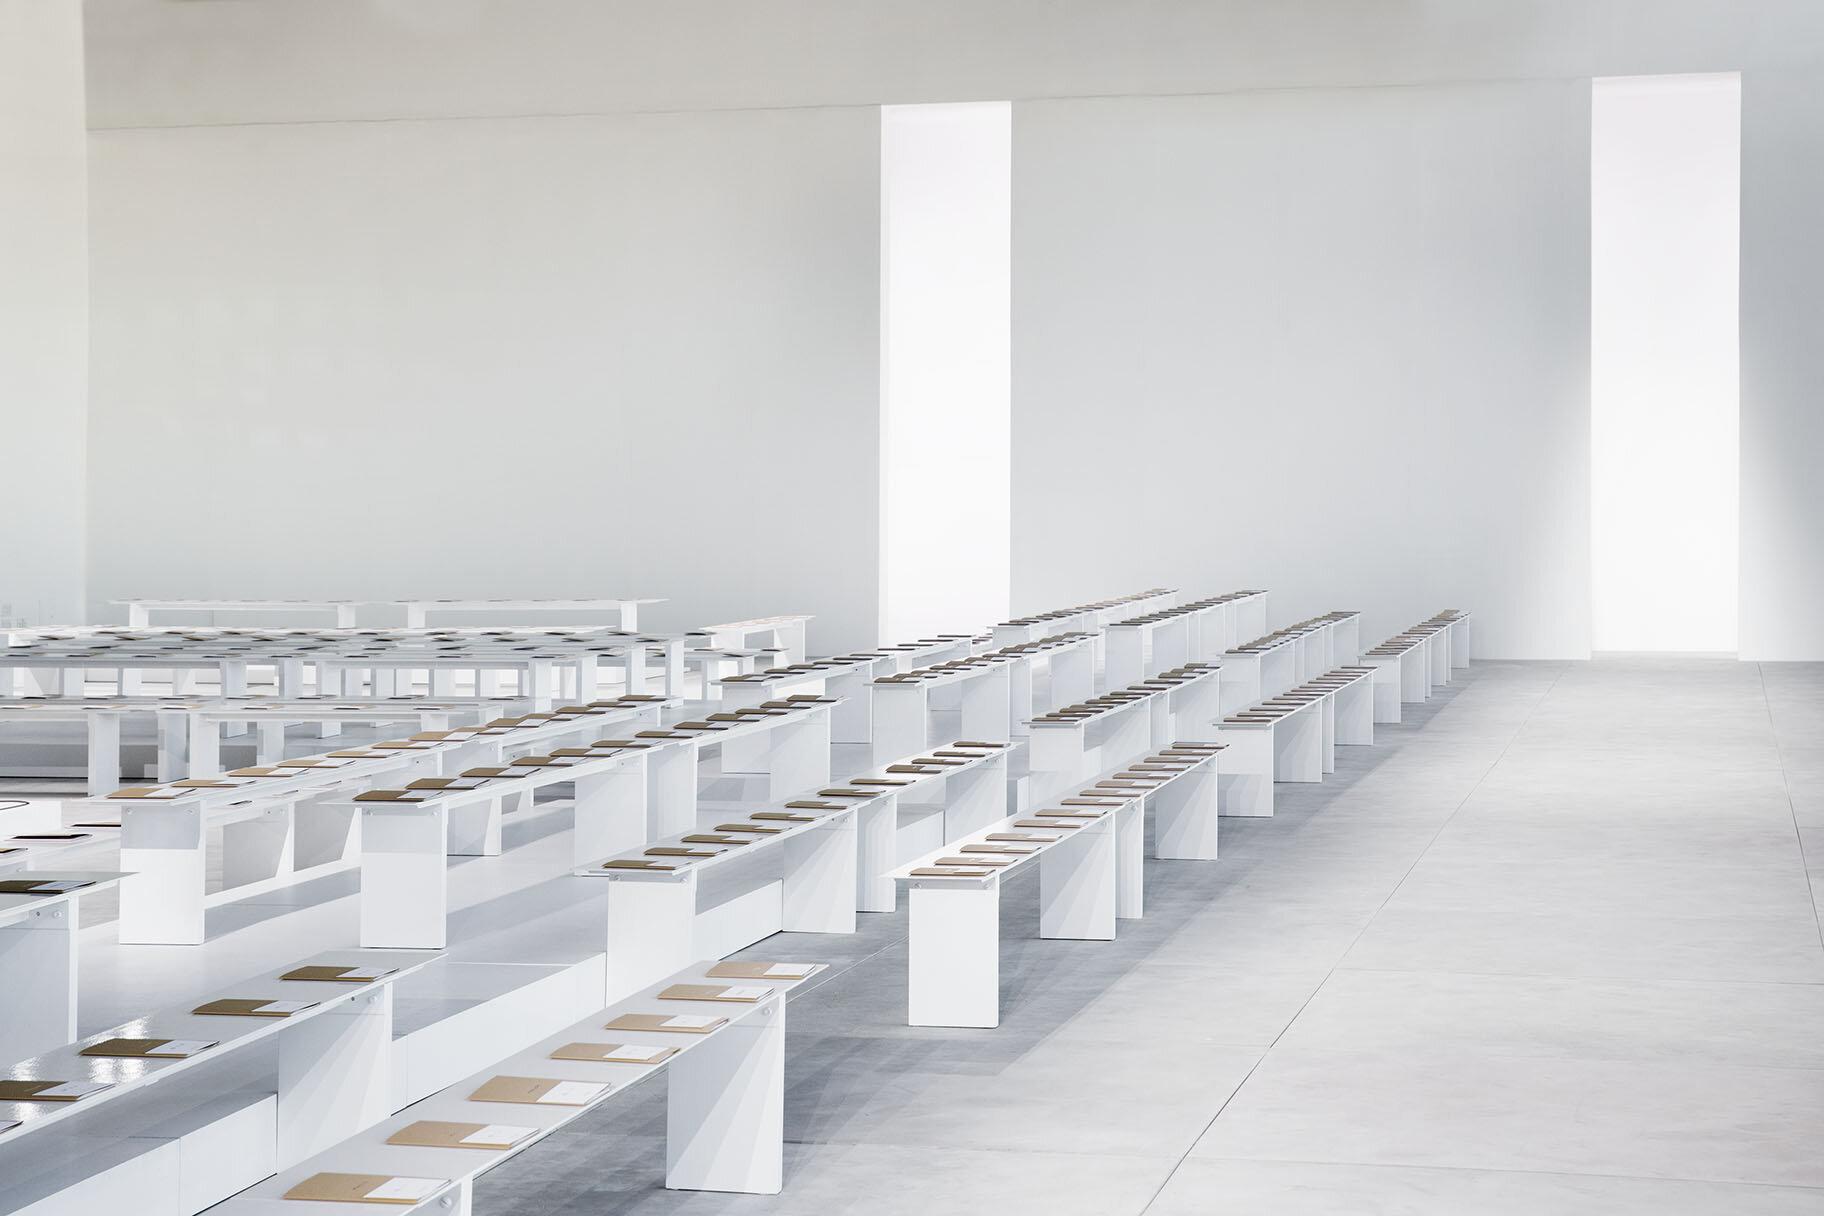 bureau-betak-michael-kors-new-york-gallery-guillaume-ziccarelli-02.jpg